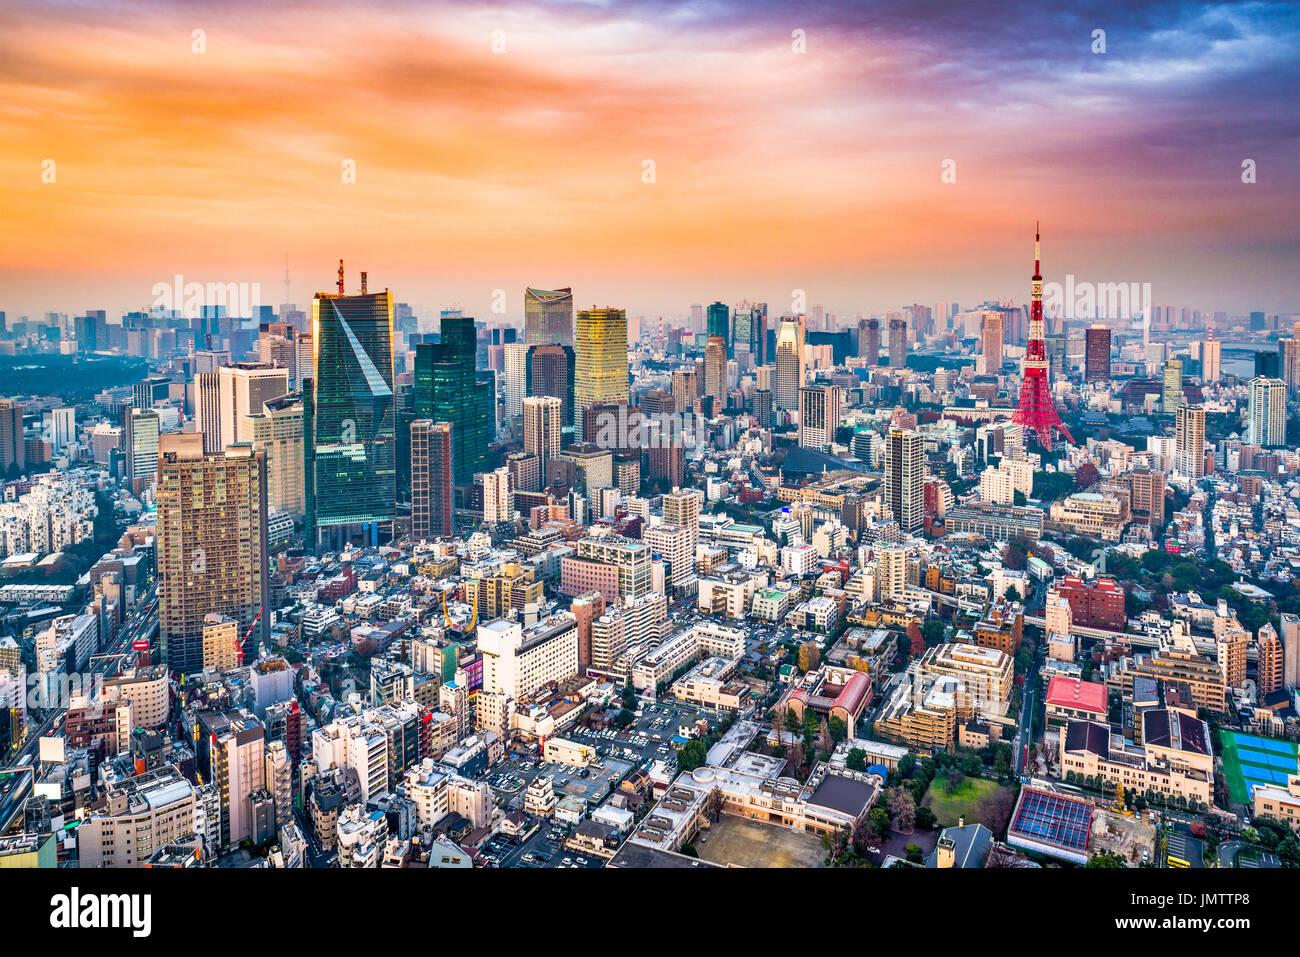 Skyline von Tokyo, Japan. Stockbild